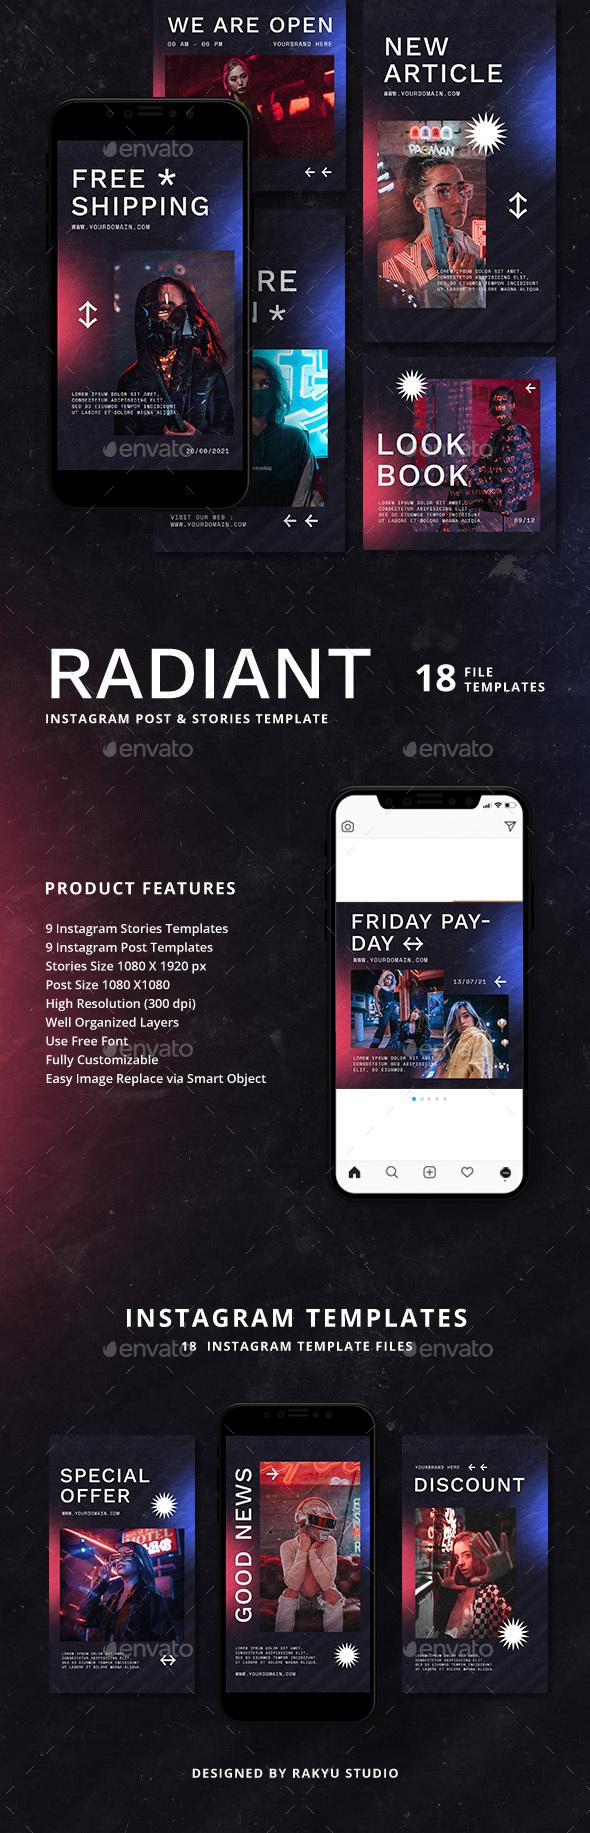 Radiant - Instagram Templates